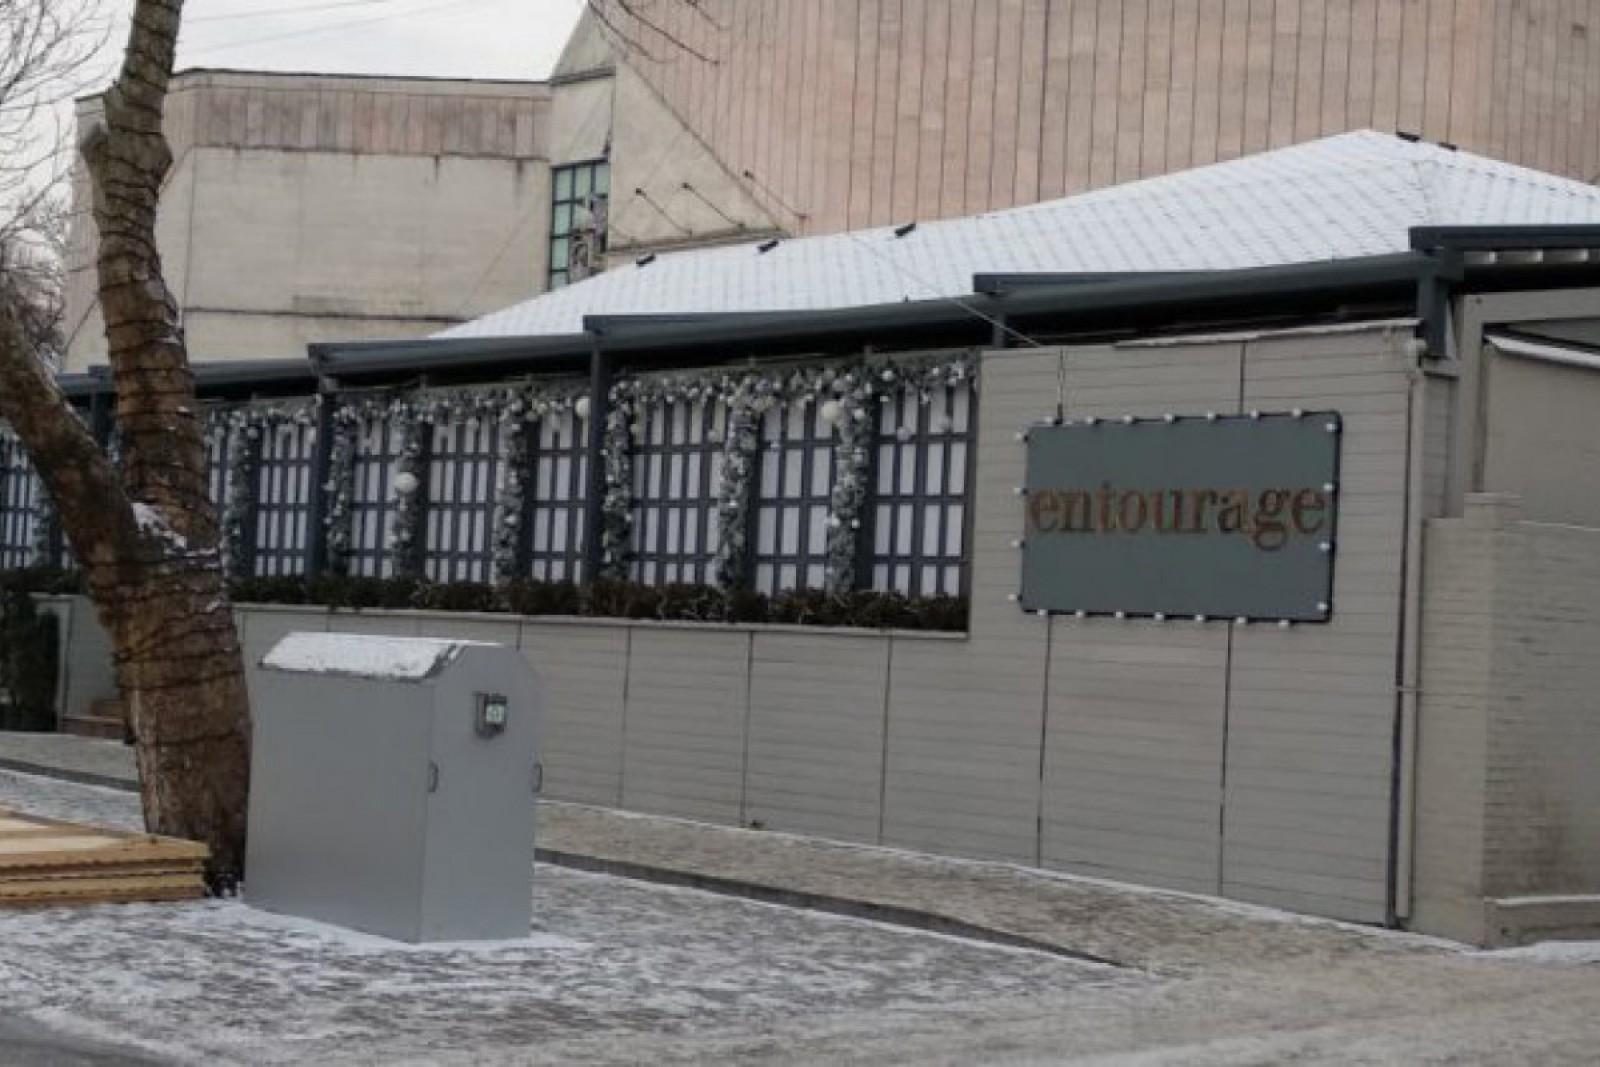 Vlad Plahotniuc și-a deschis un nou restaurant în centrul capitalei: Entourage